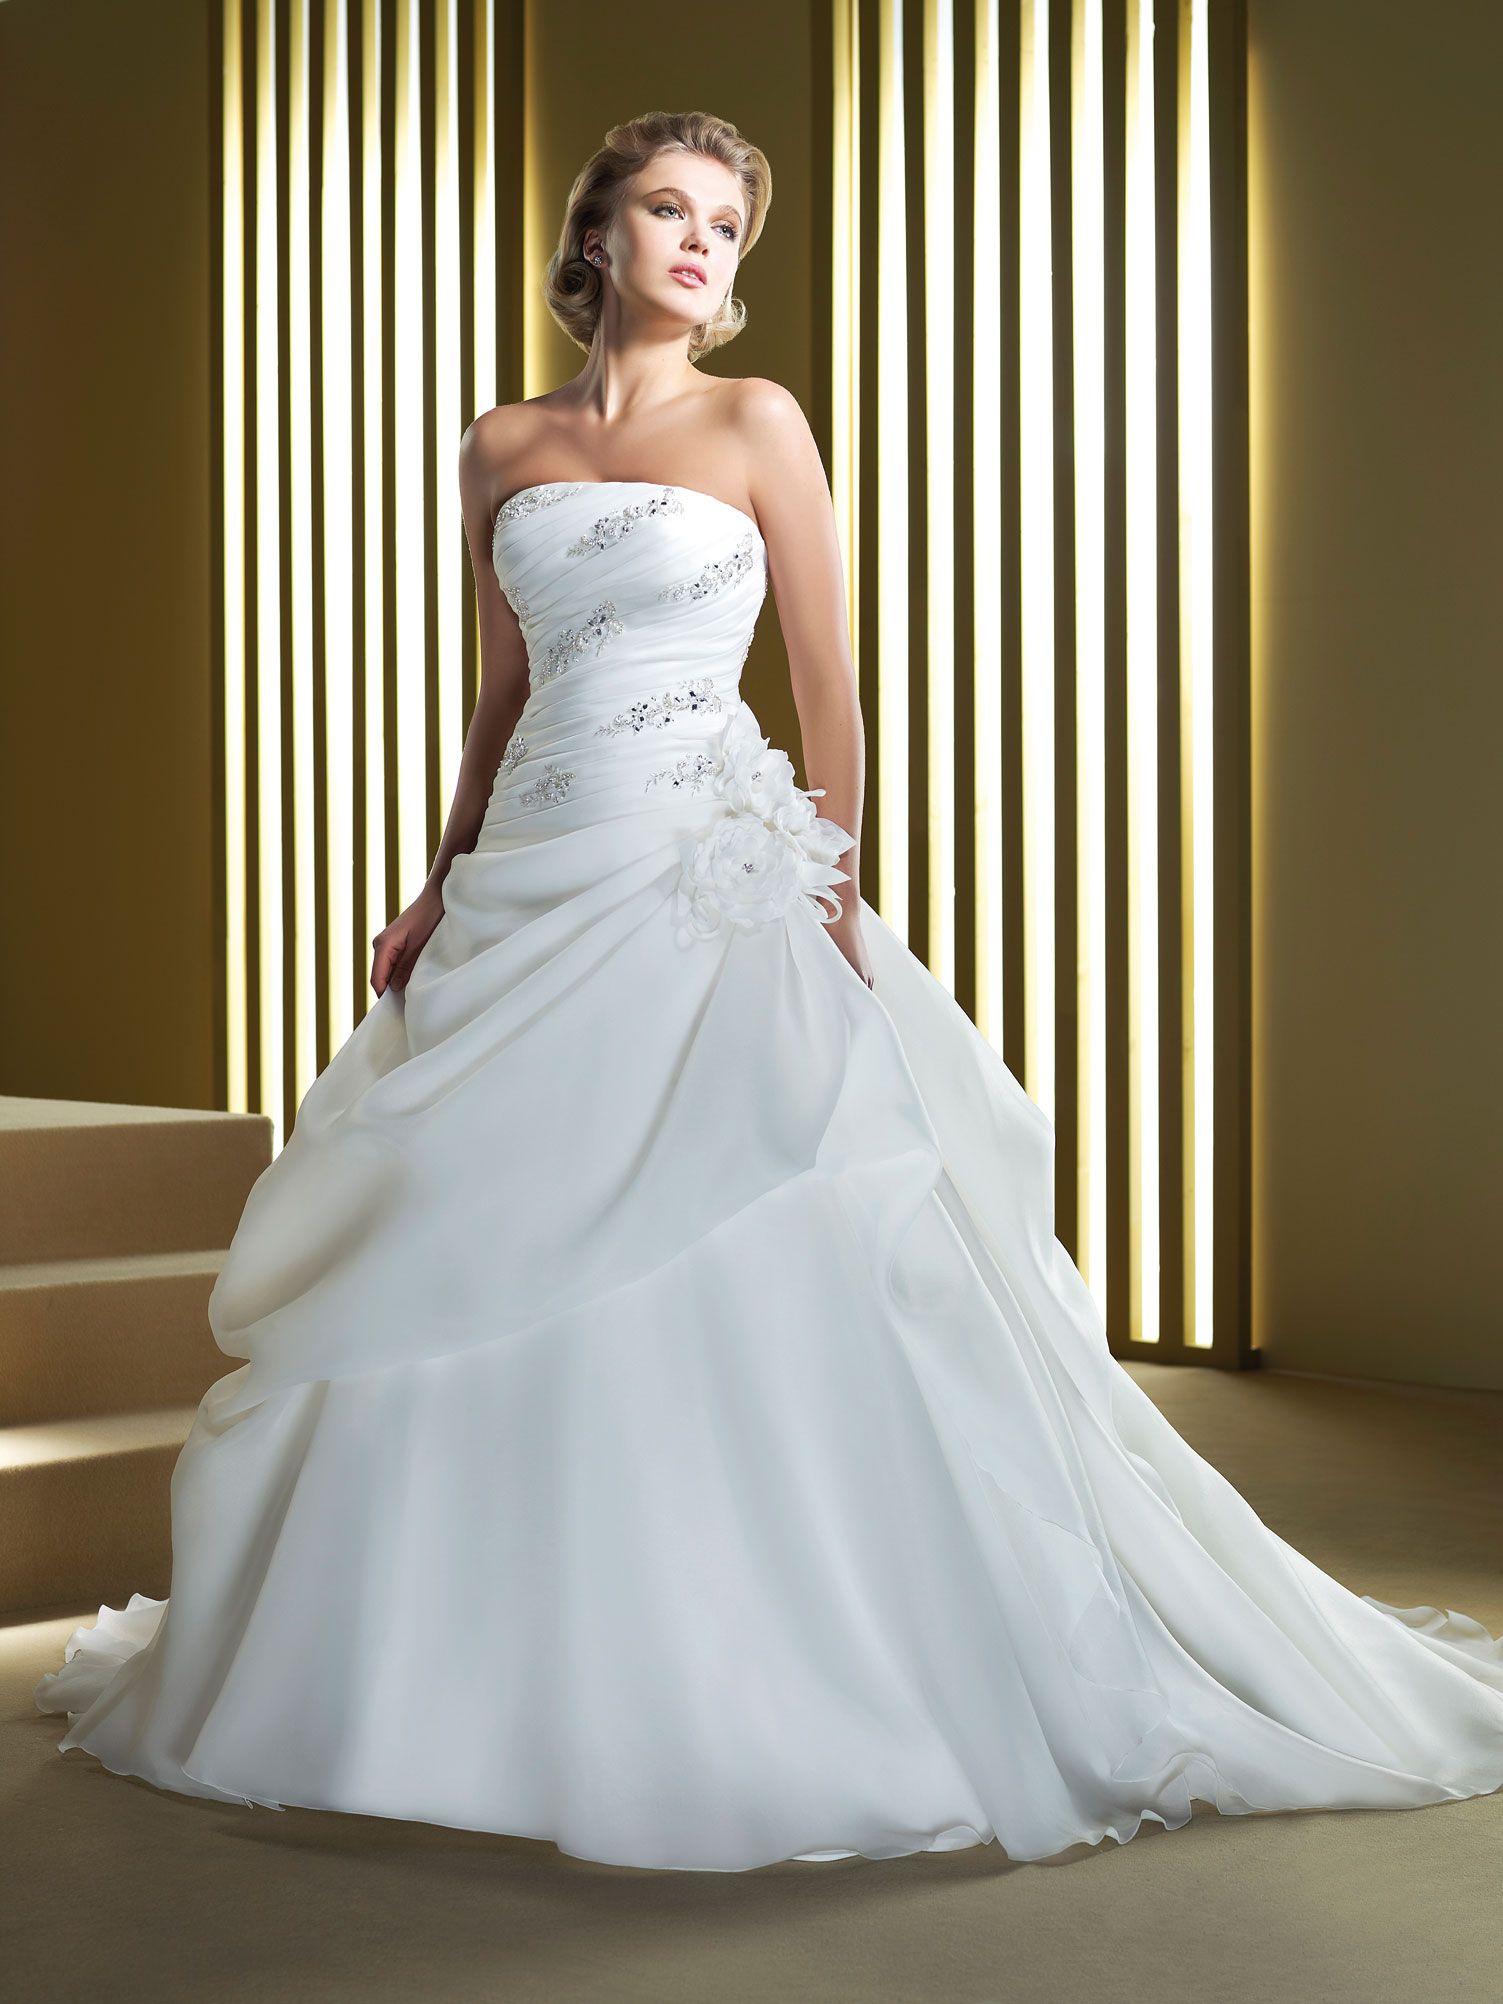 Elianna Moore Bridal Gown Style - EL1188 | Bidal Gown | Pinterest